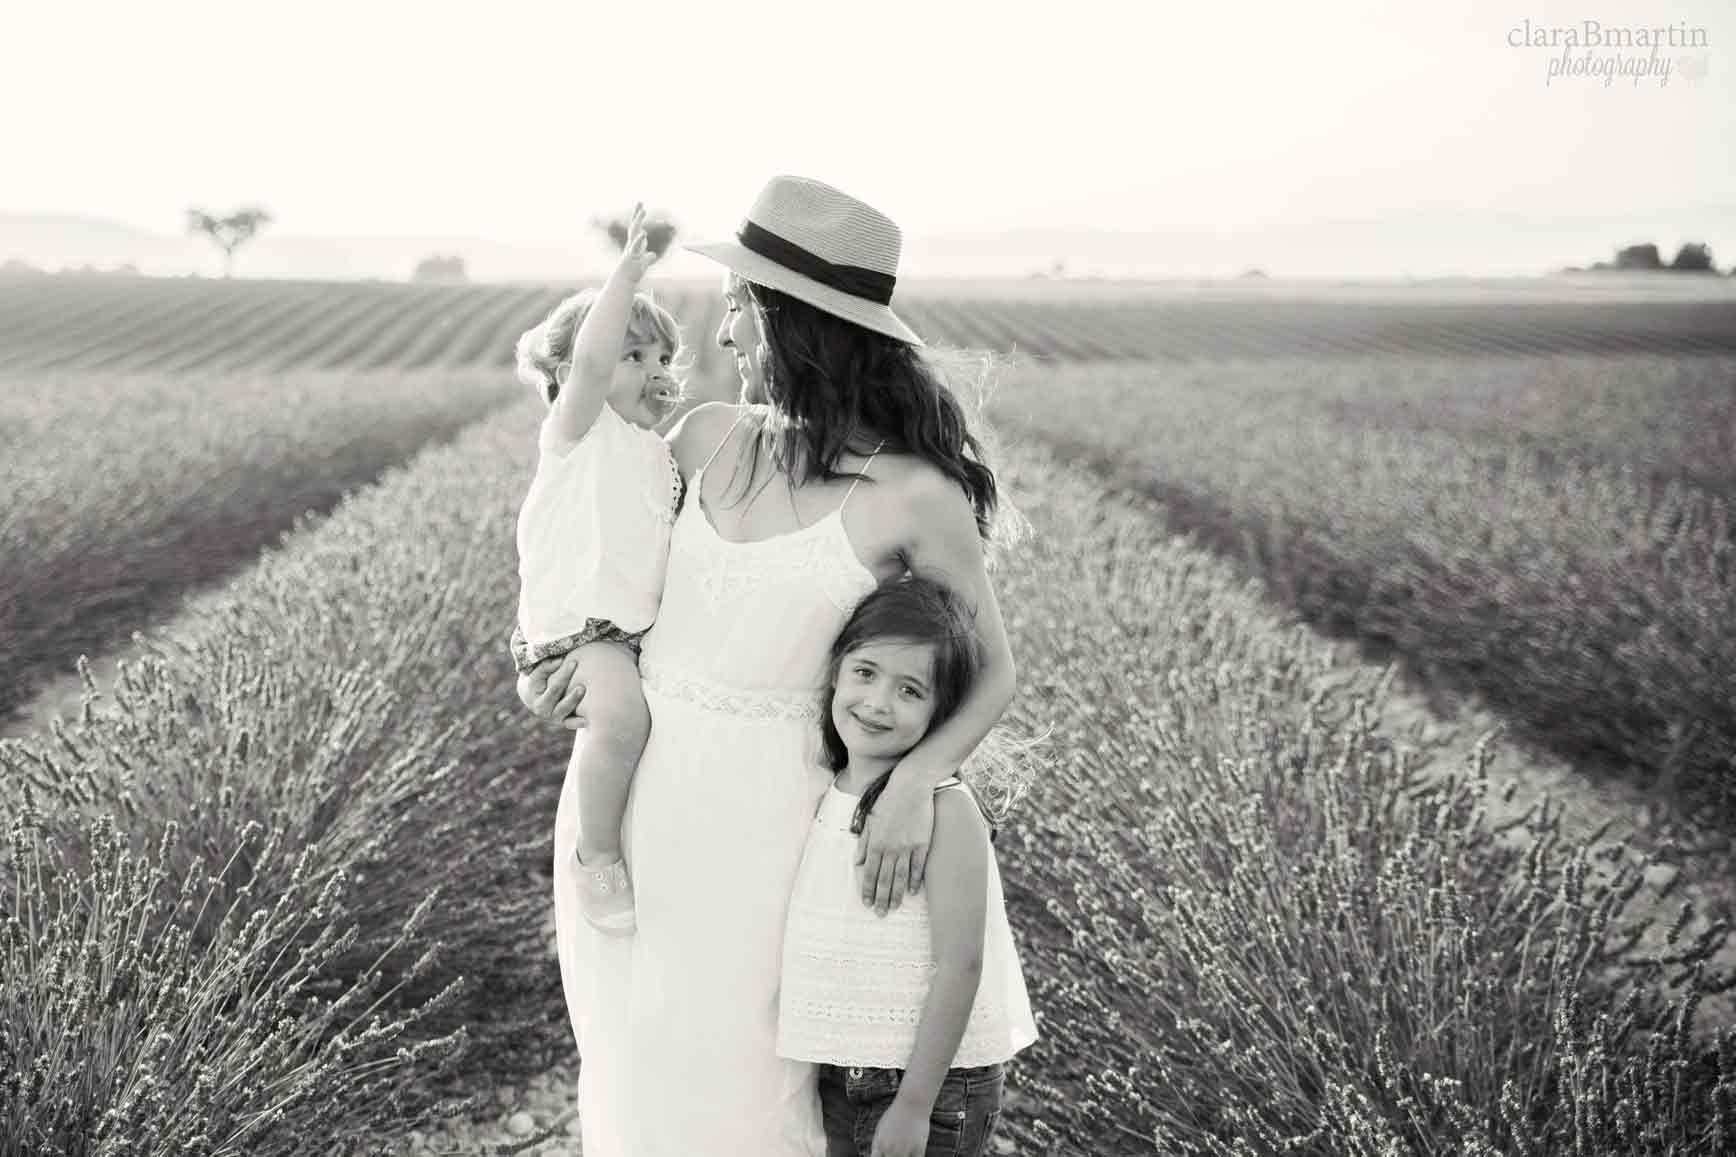 Lavender-fields-Provence-claraBmartin10